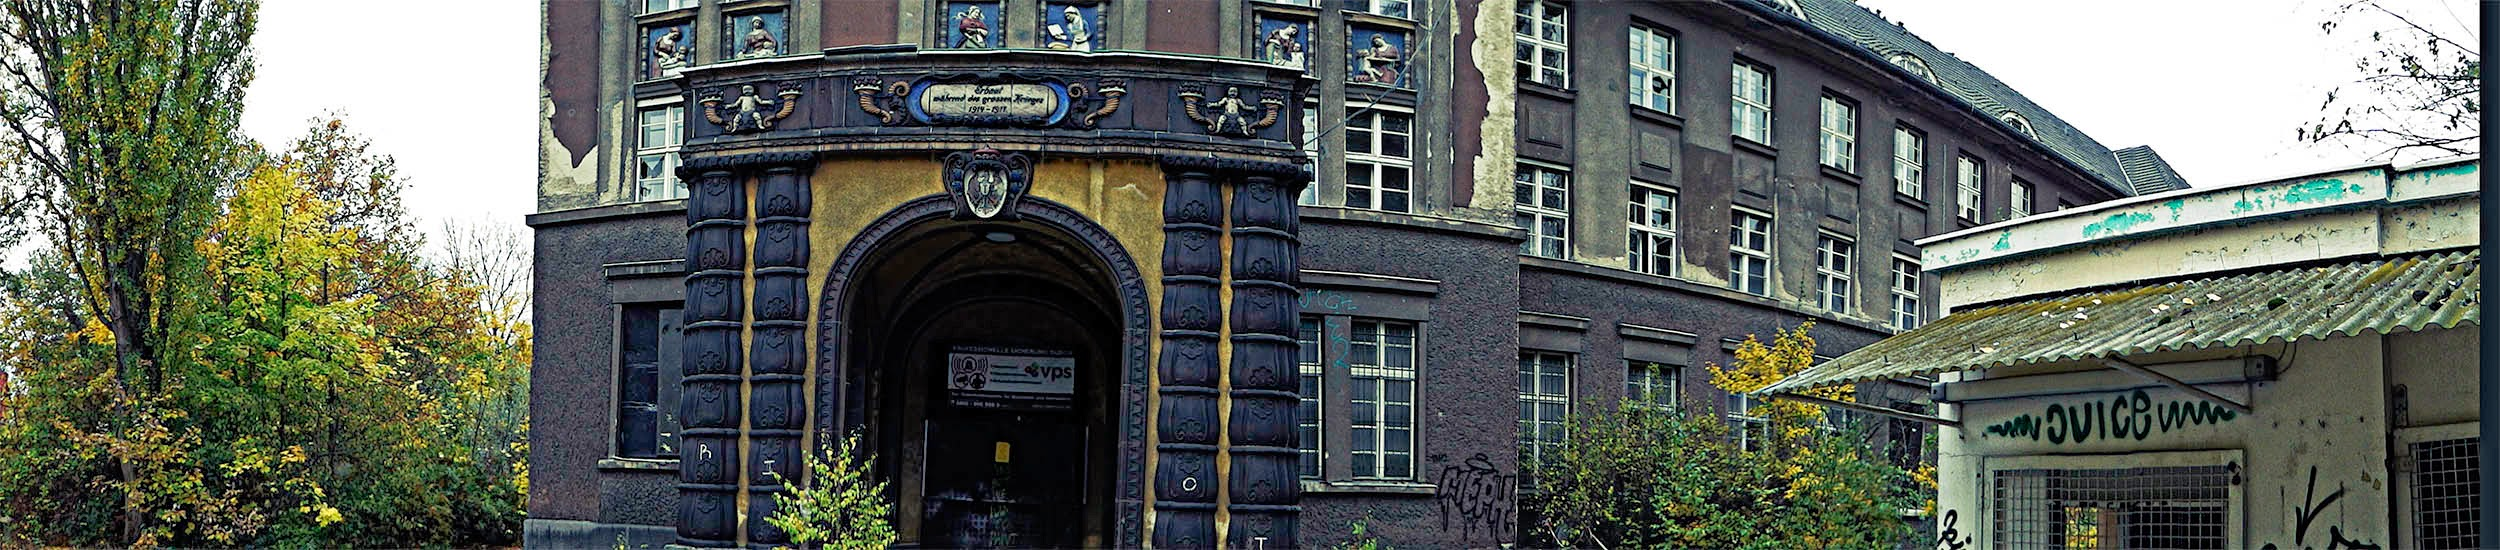 Alte Krankenhaus Neukölln